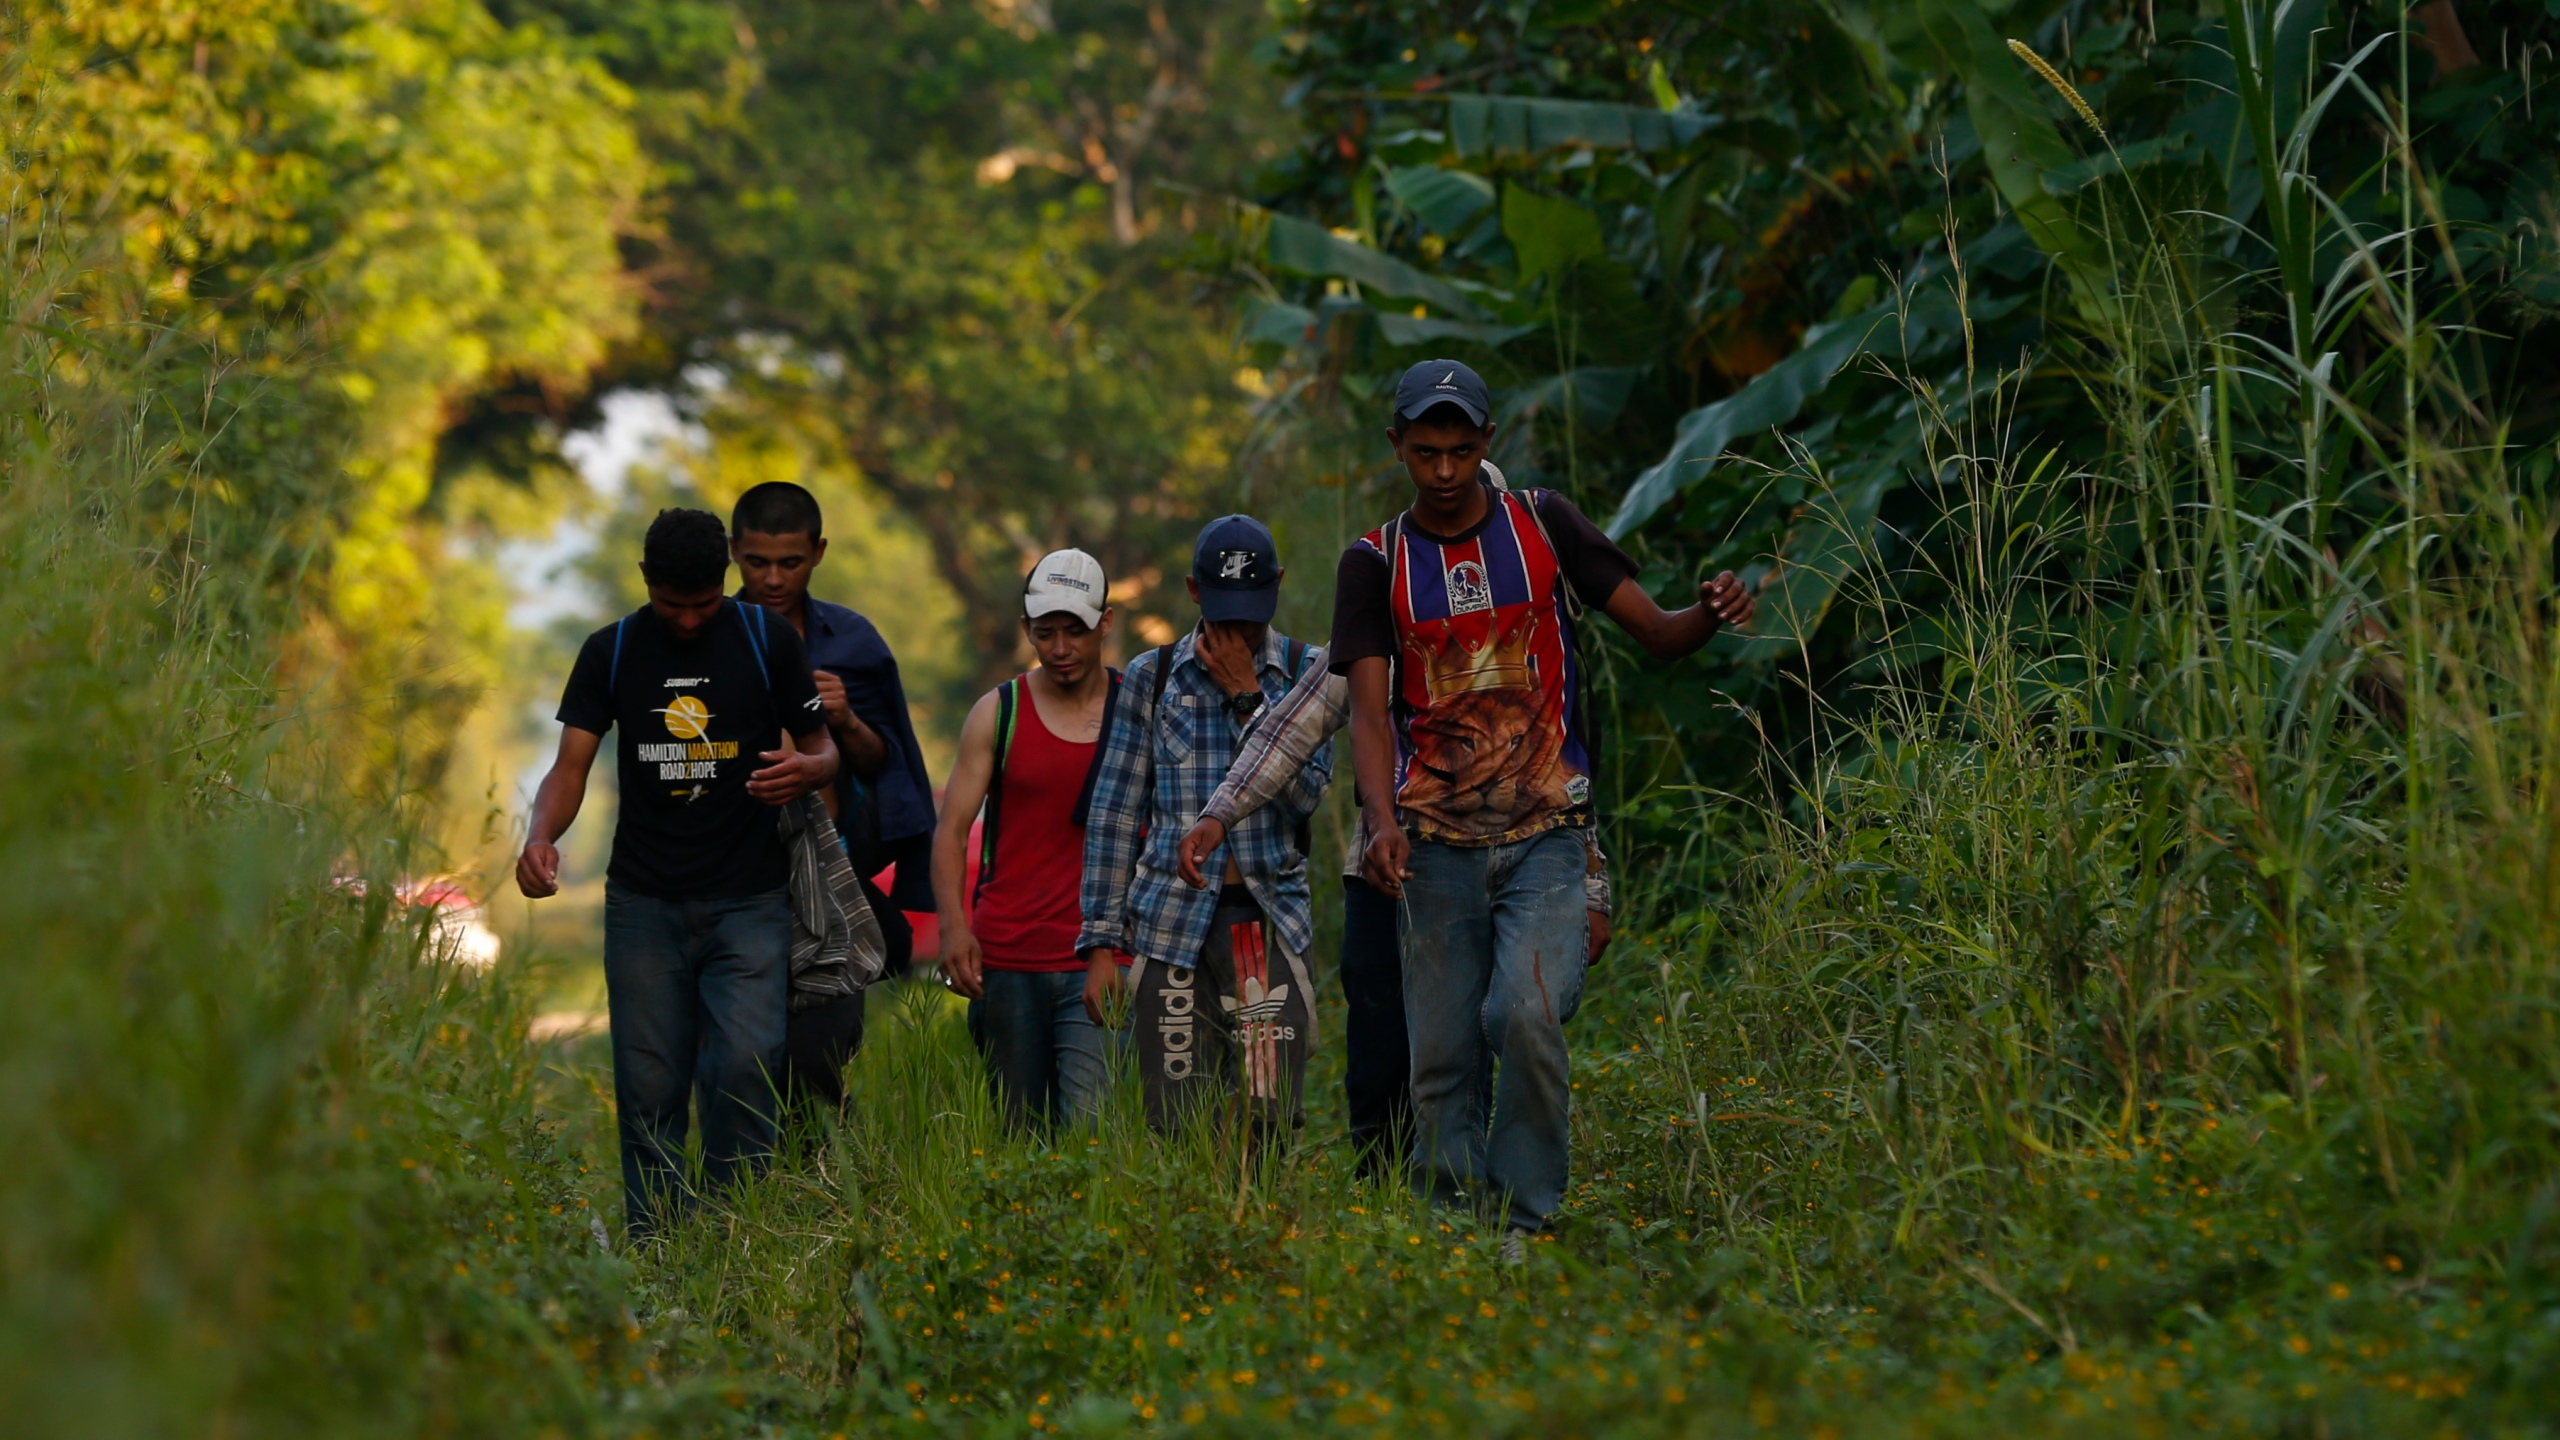 Central_America_Migrant_Caravan_03275-159532.jpg50616343